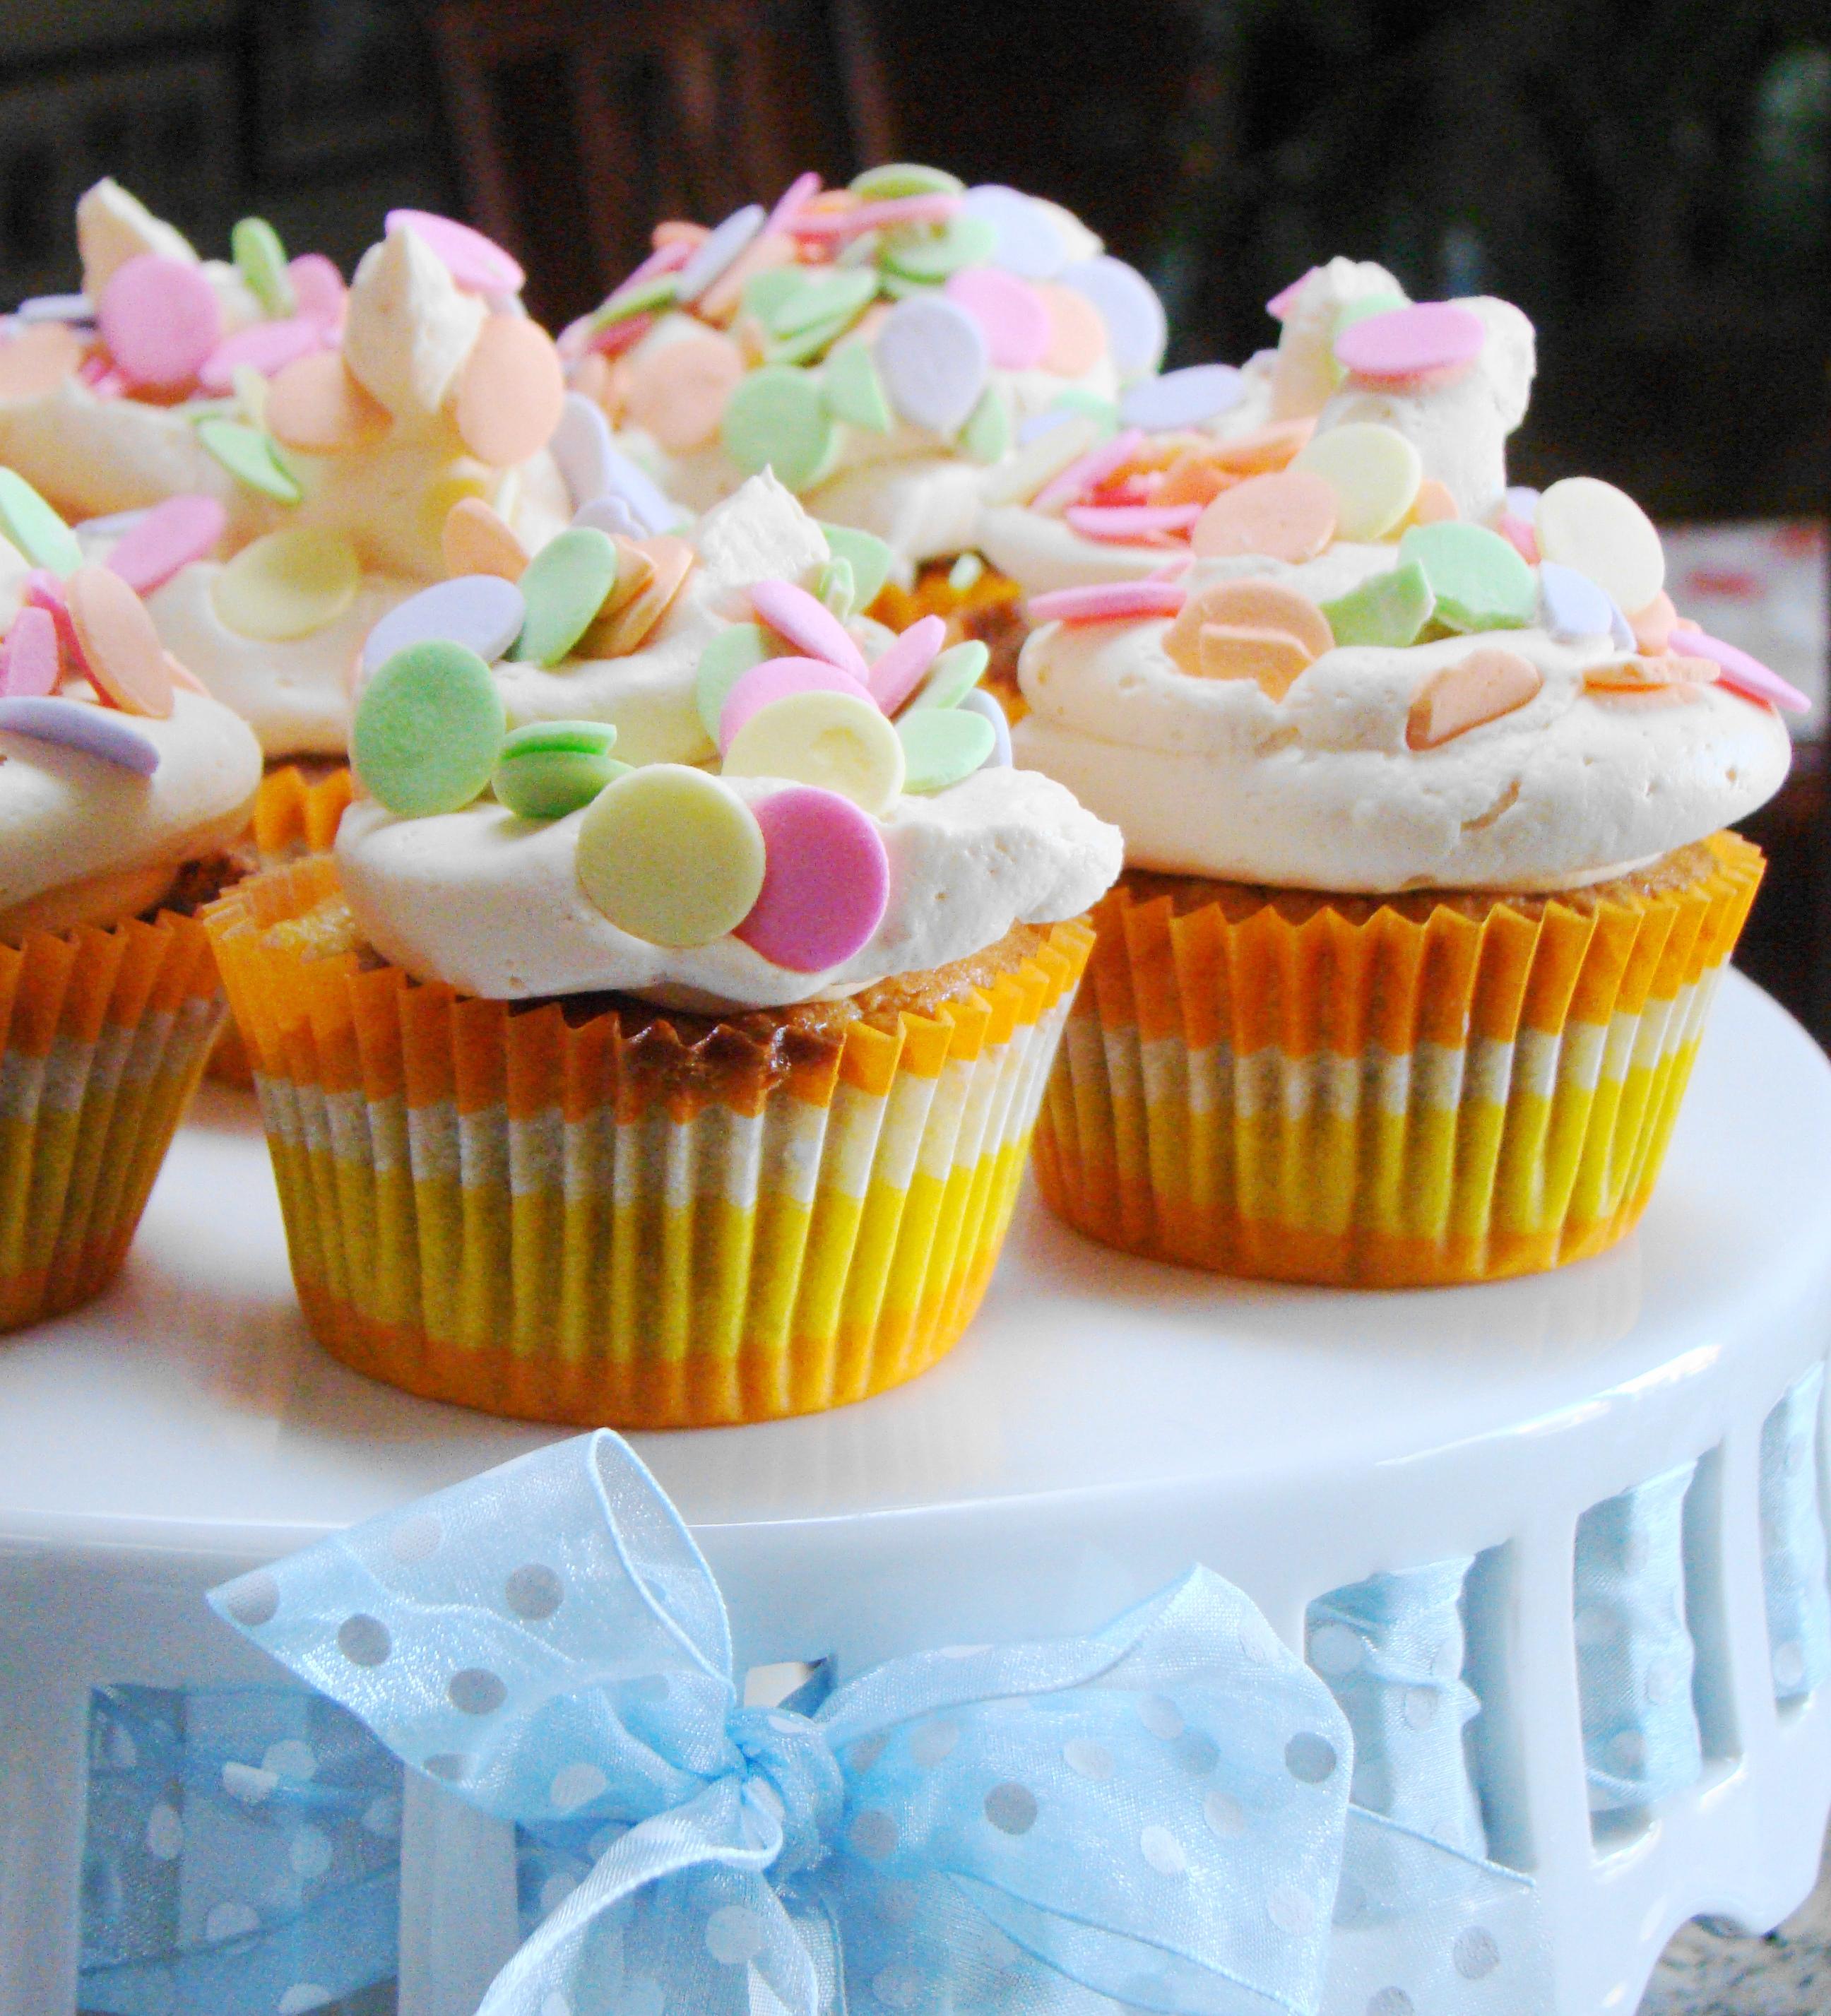 Free images ginger cupcakes cupcake buttercream baking whipped cream muffin cake - Creme decoration cupcake ...